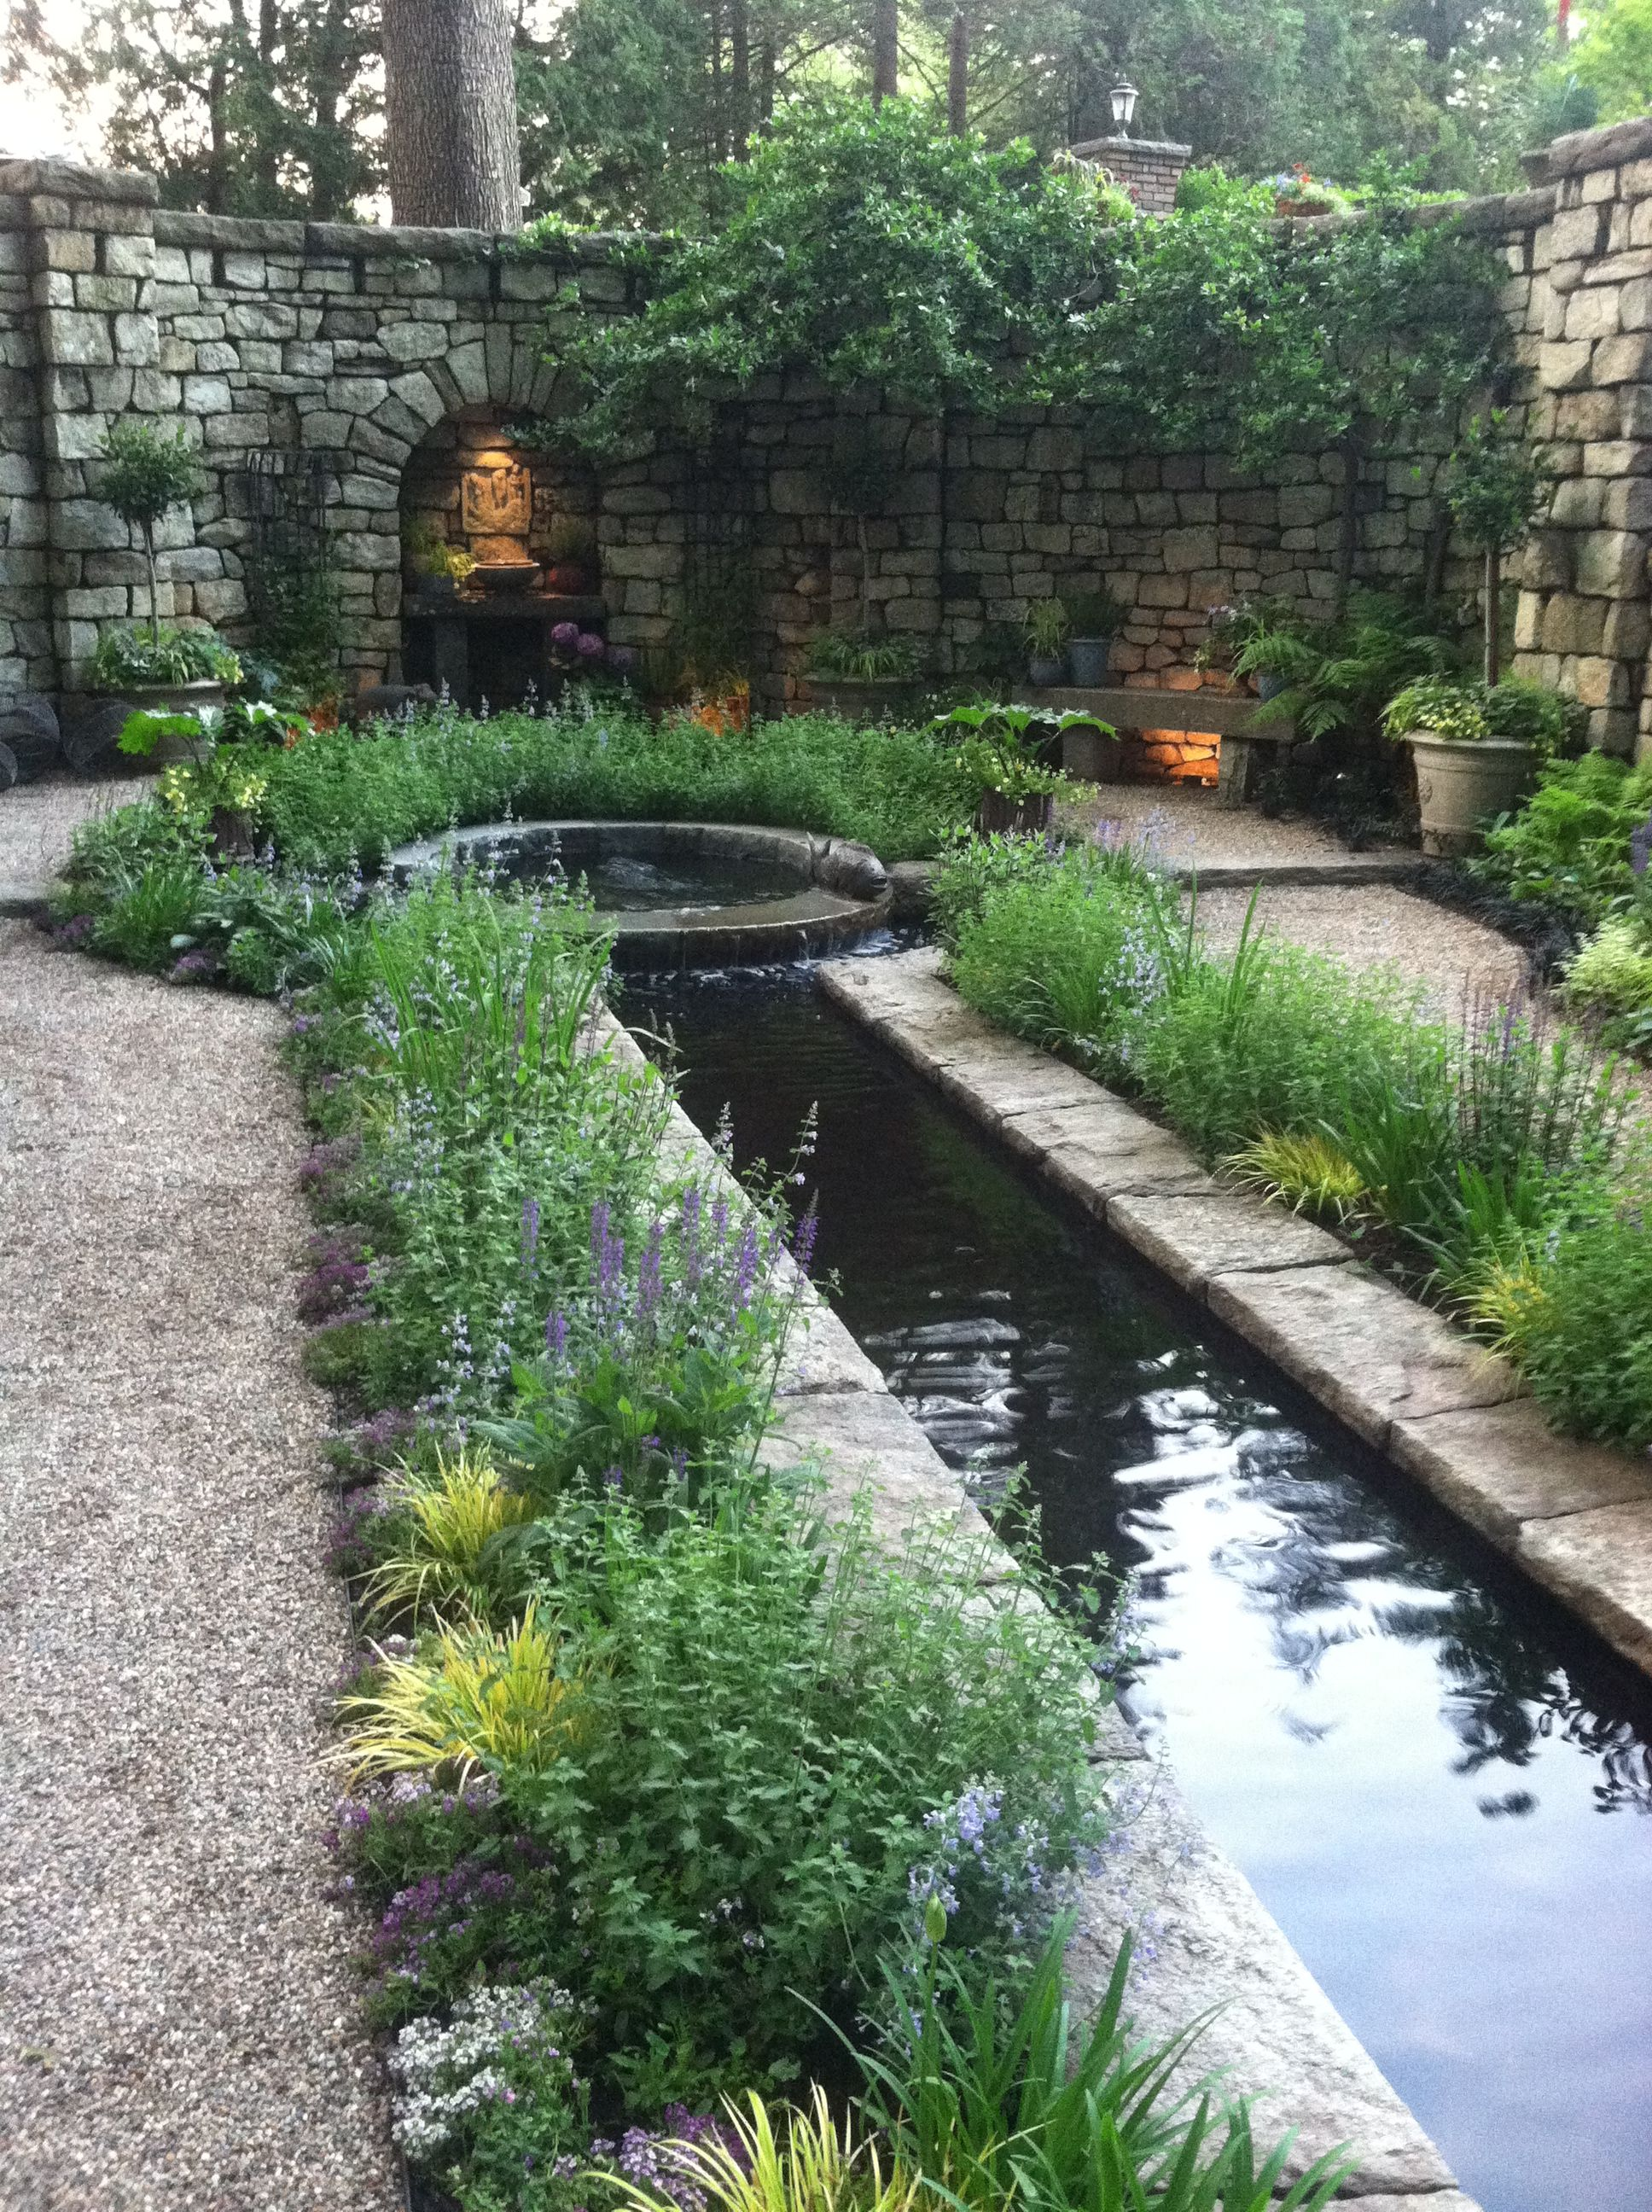 Our Garden At Dusk Cording Landscape Design Nj 400 x 300